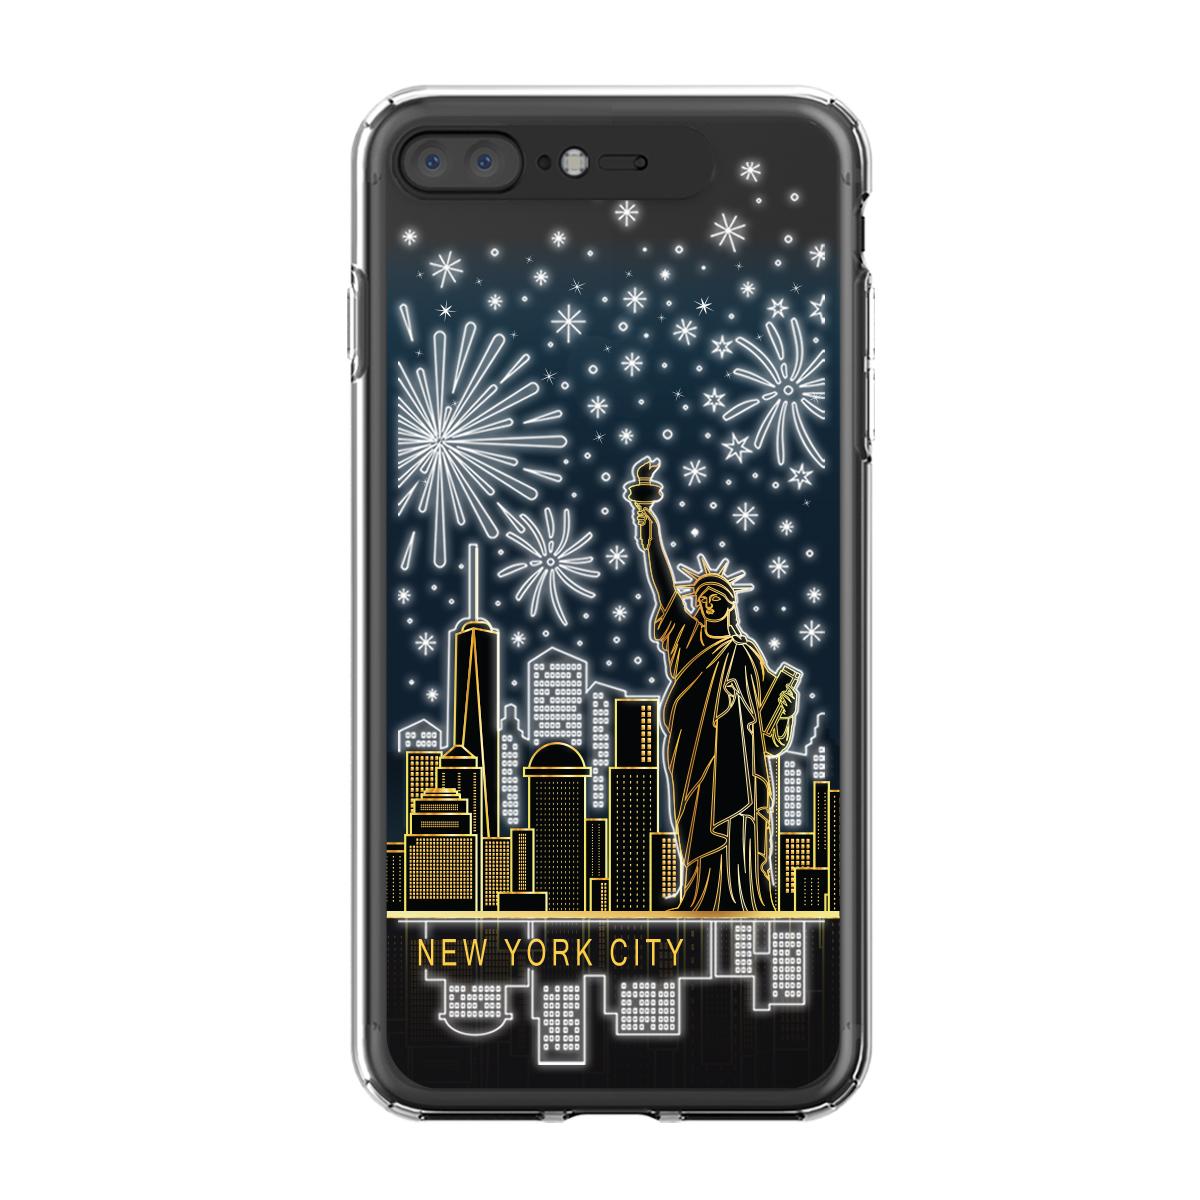 iPhone 8 Plus/7 Plus ケース LIGHT UP CASE Soft Lighting Clear Case Landmark(ライトアップケース ソフトライティングクリアケース ランドマーク)光る アイフォン カバー5.5インチ